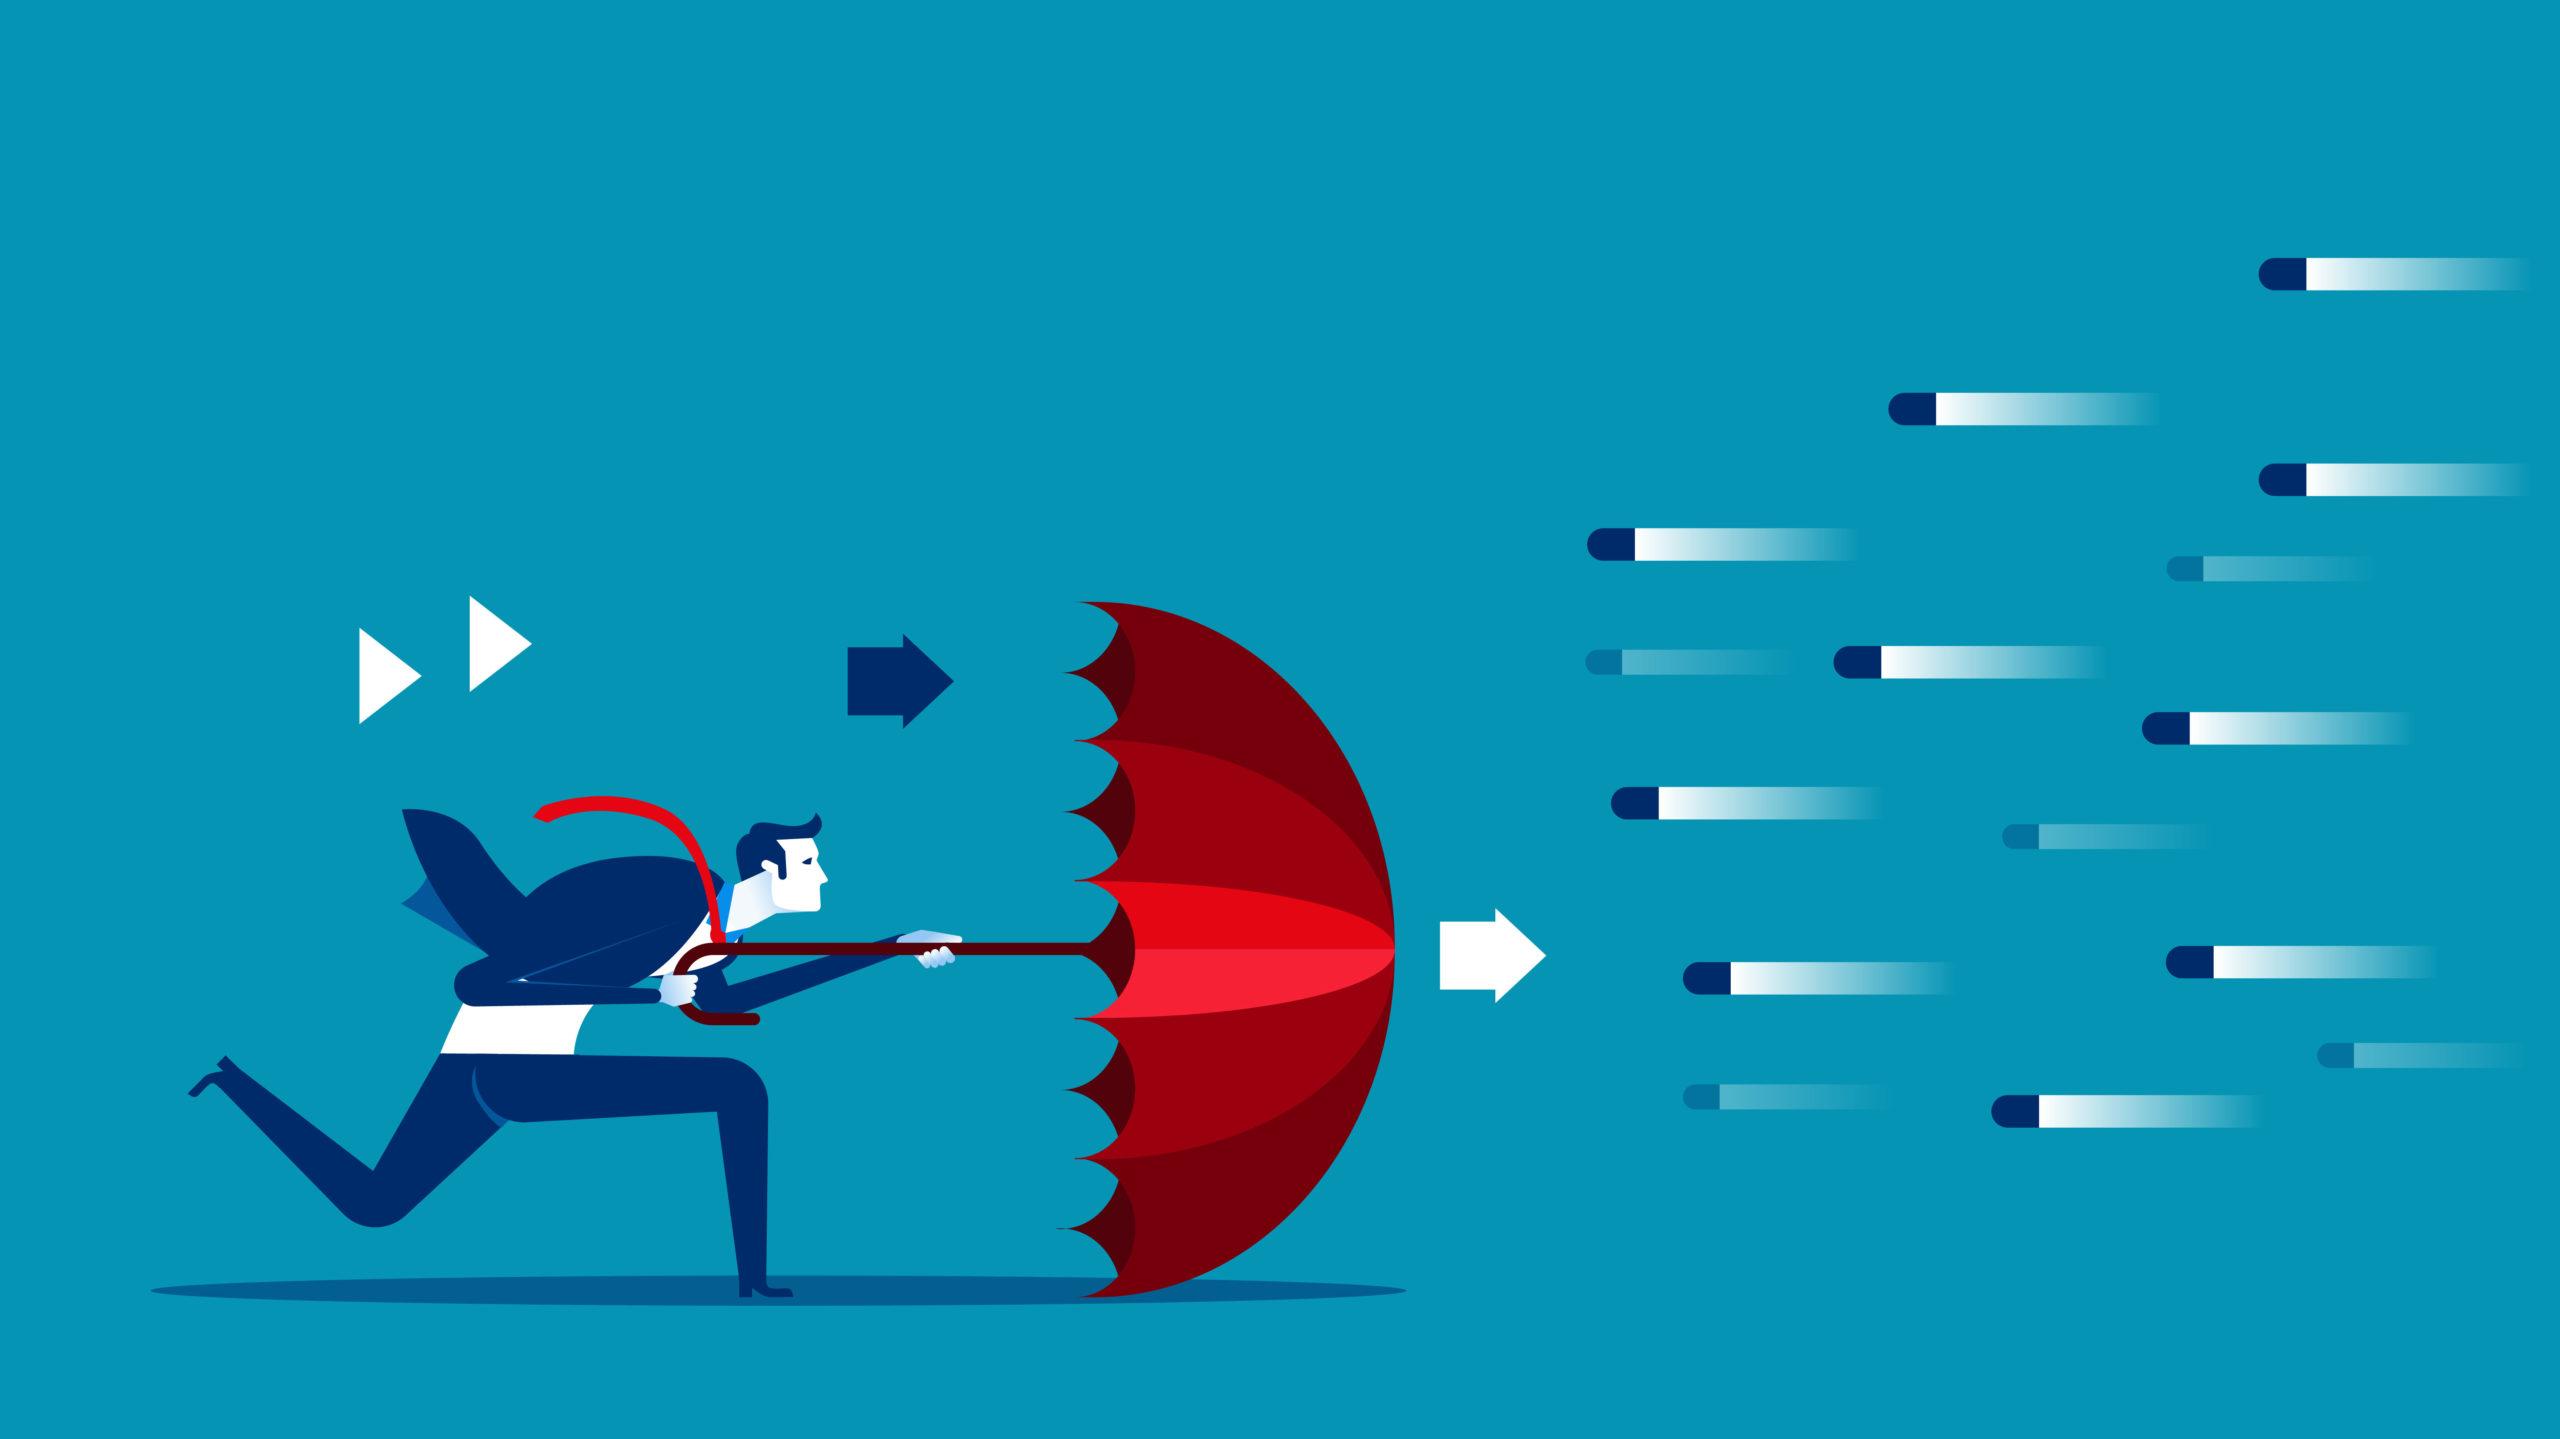 vector image of male client avoiding risk